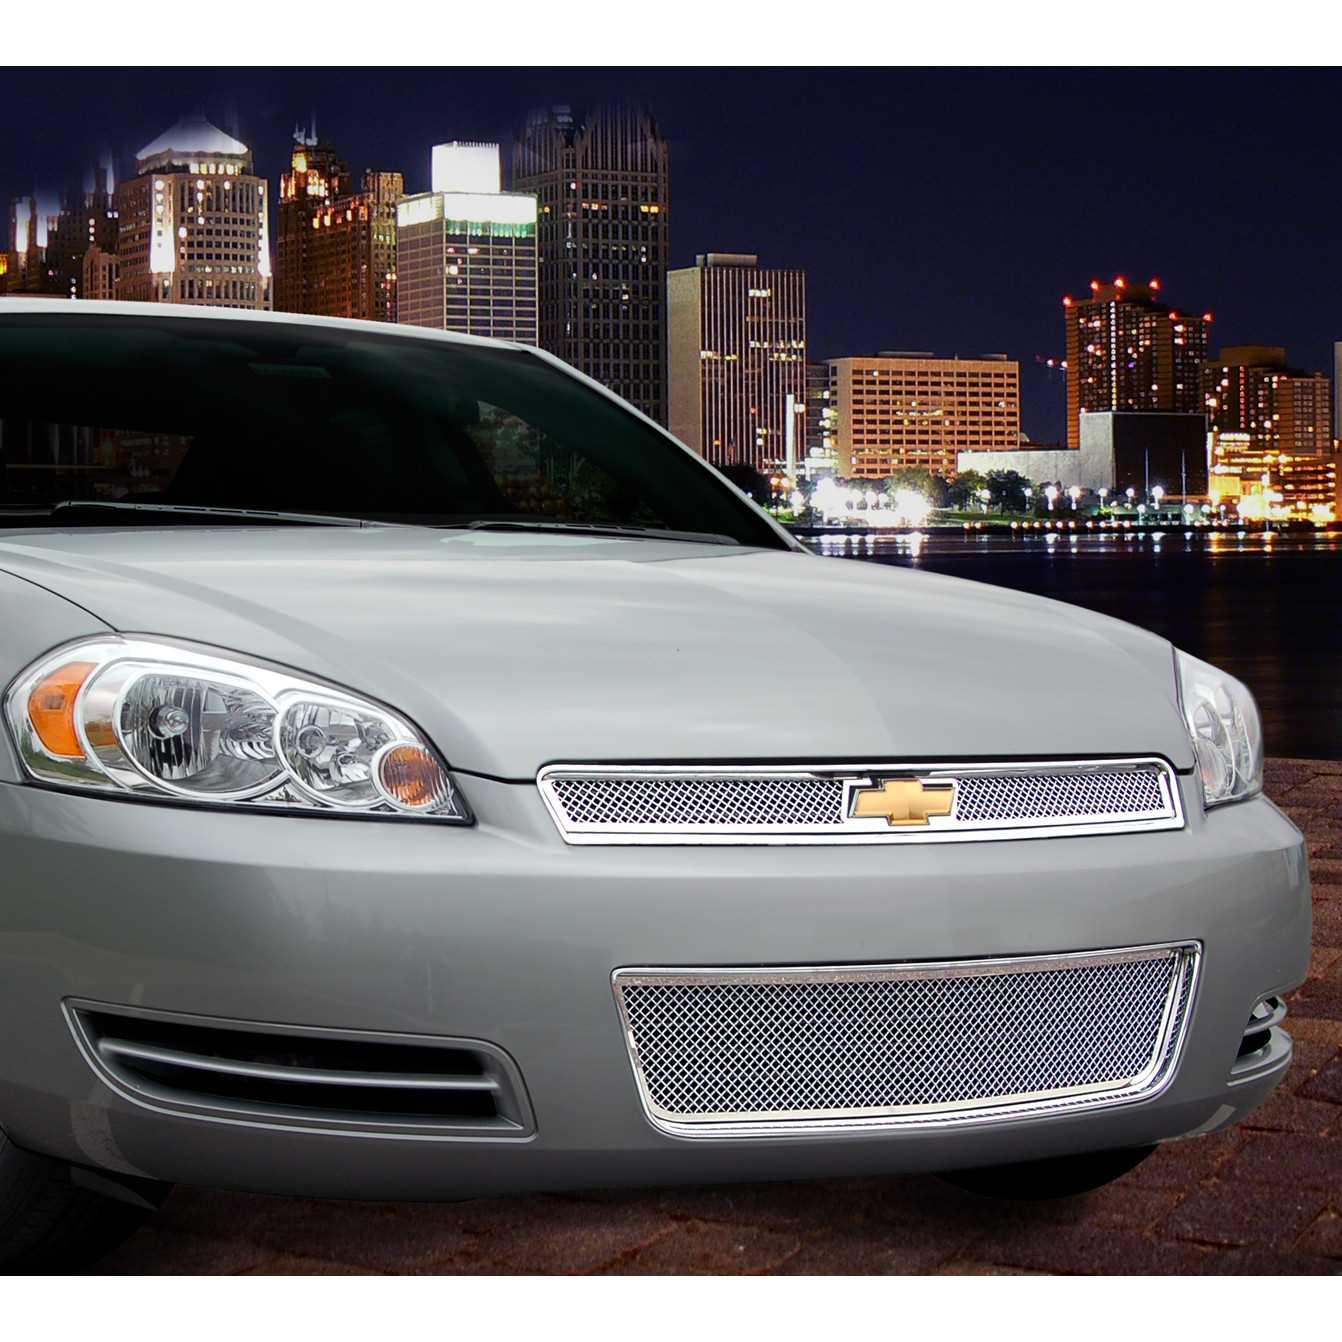 chevrolet impala custom grilles mesh grilles autos post. Black Bedroom Furniture Sets. Home Design Ideas